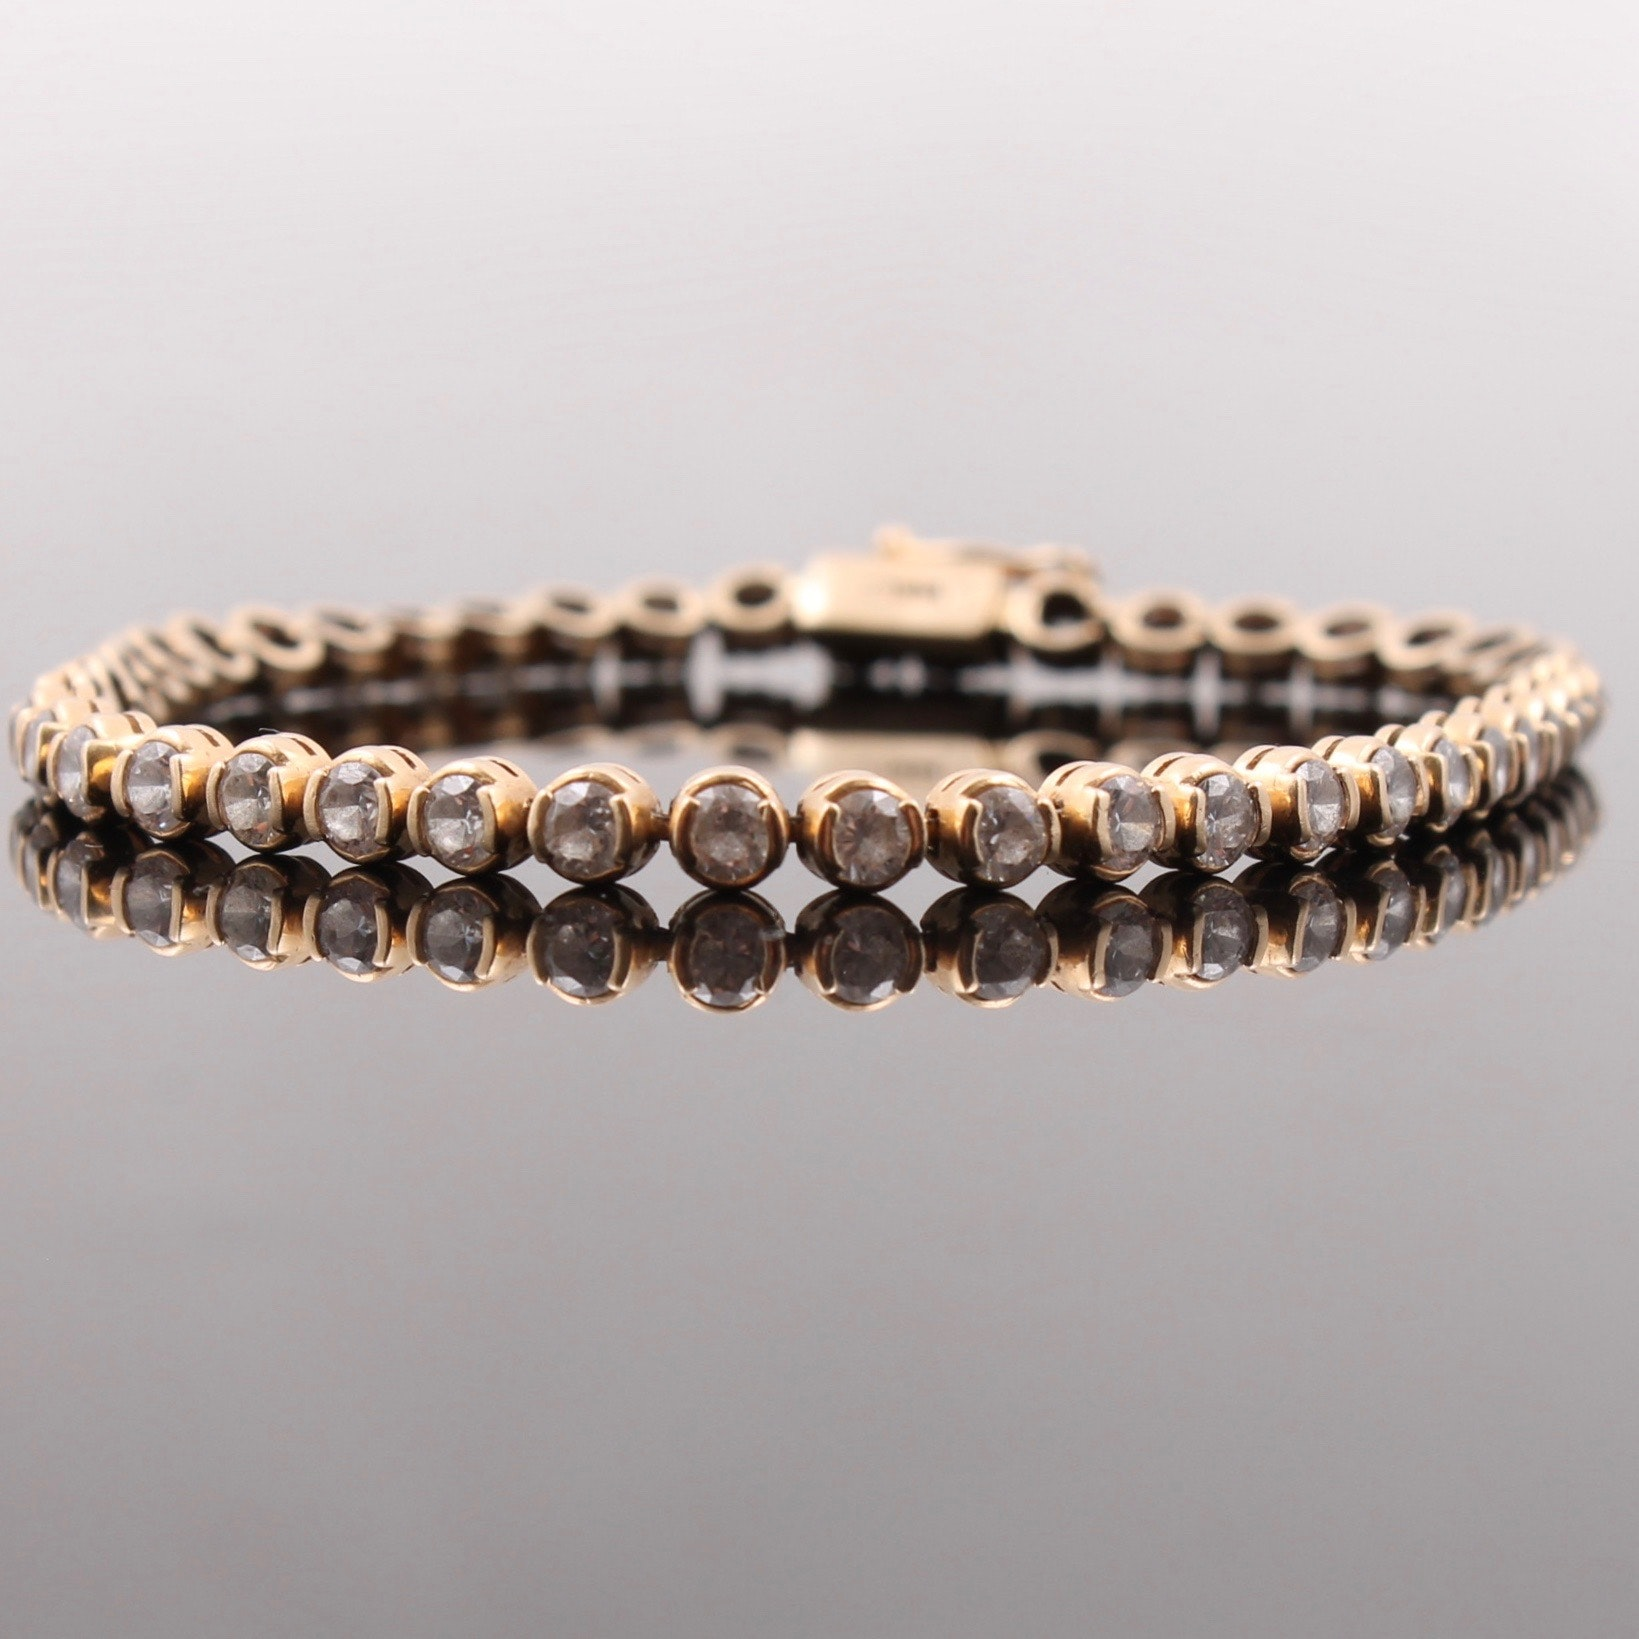 14K Yellow Gold White Sapphire Tennis Bracelet